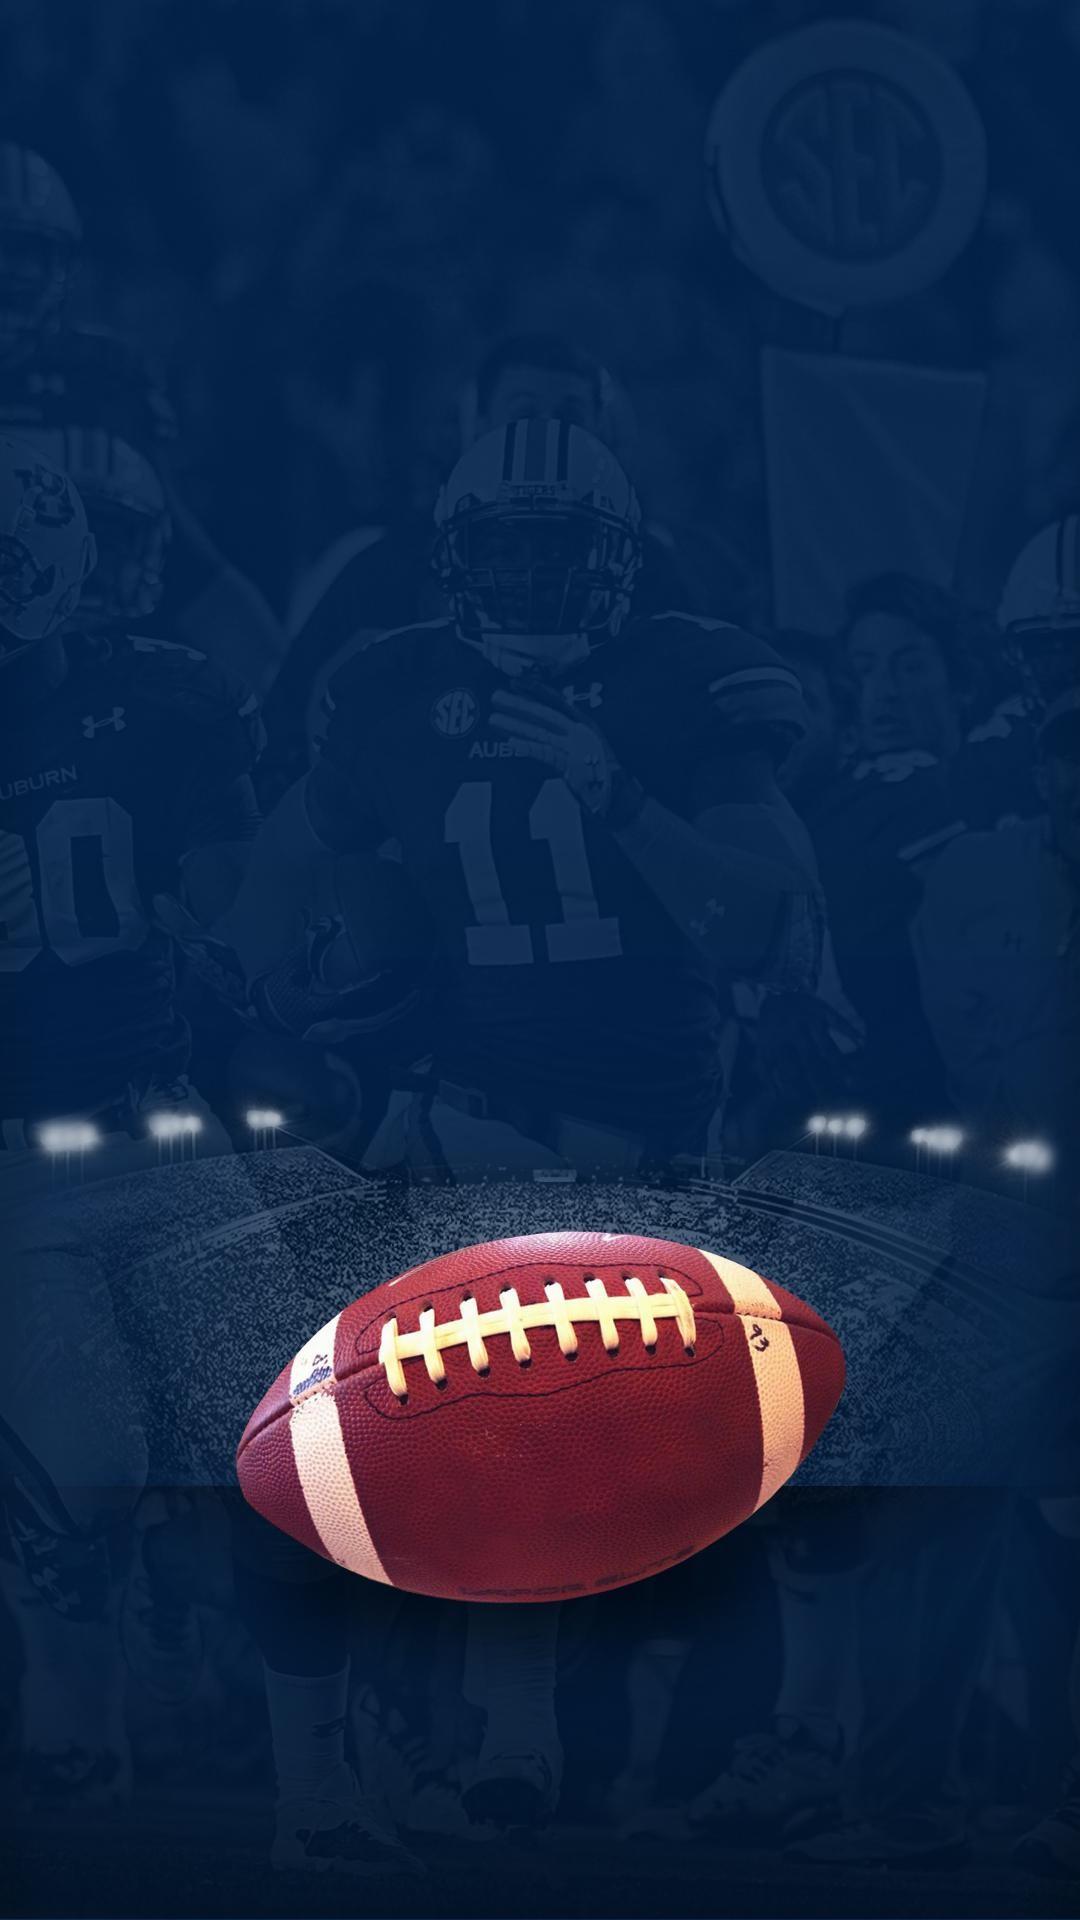 wallpaper.wiki-Free-HD-Alabama-Football-Wallpaper-for-